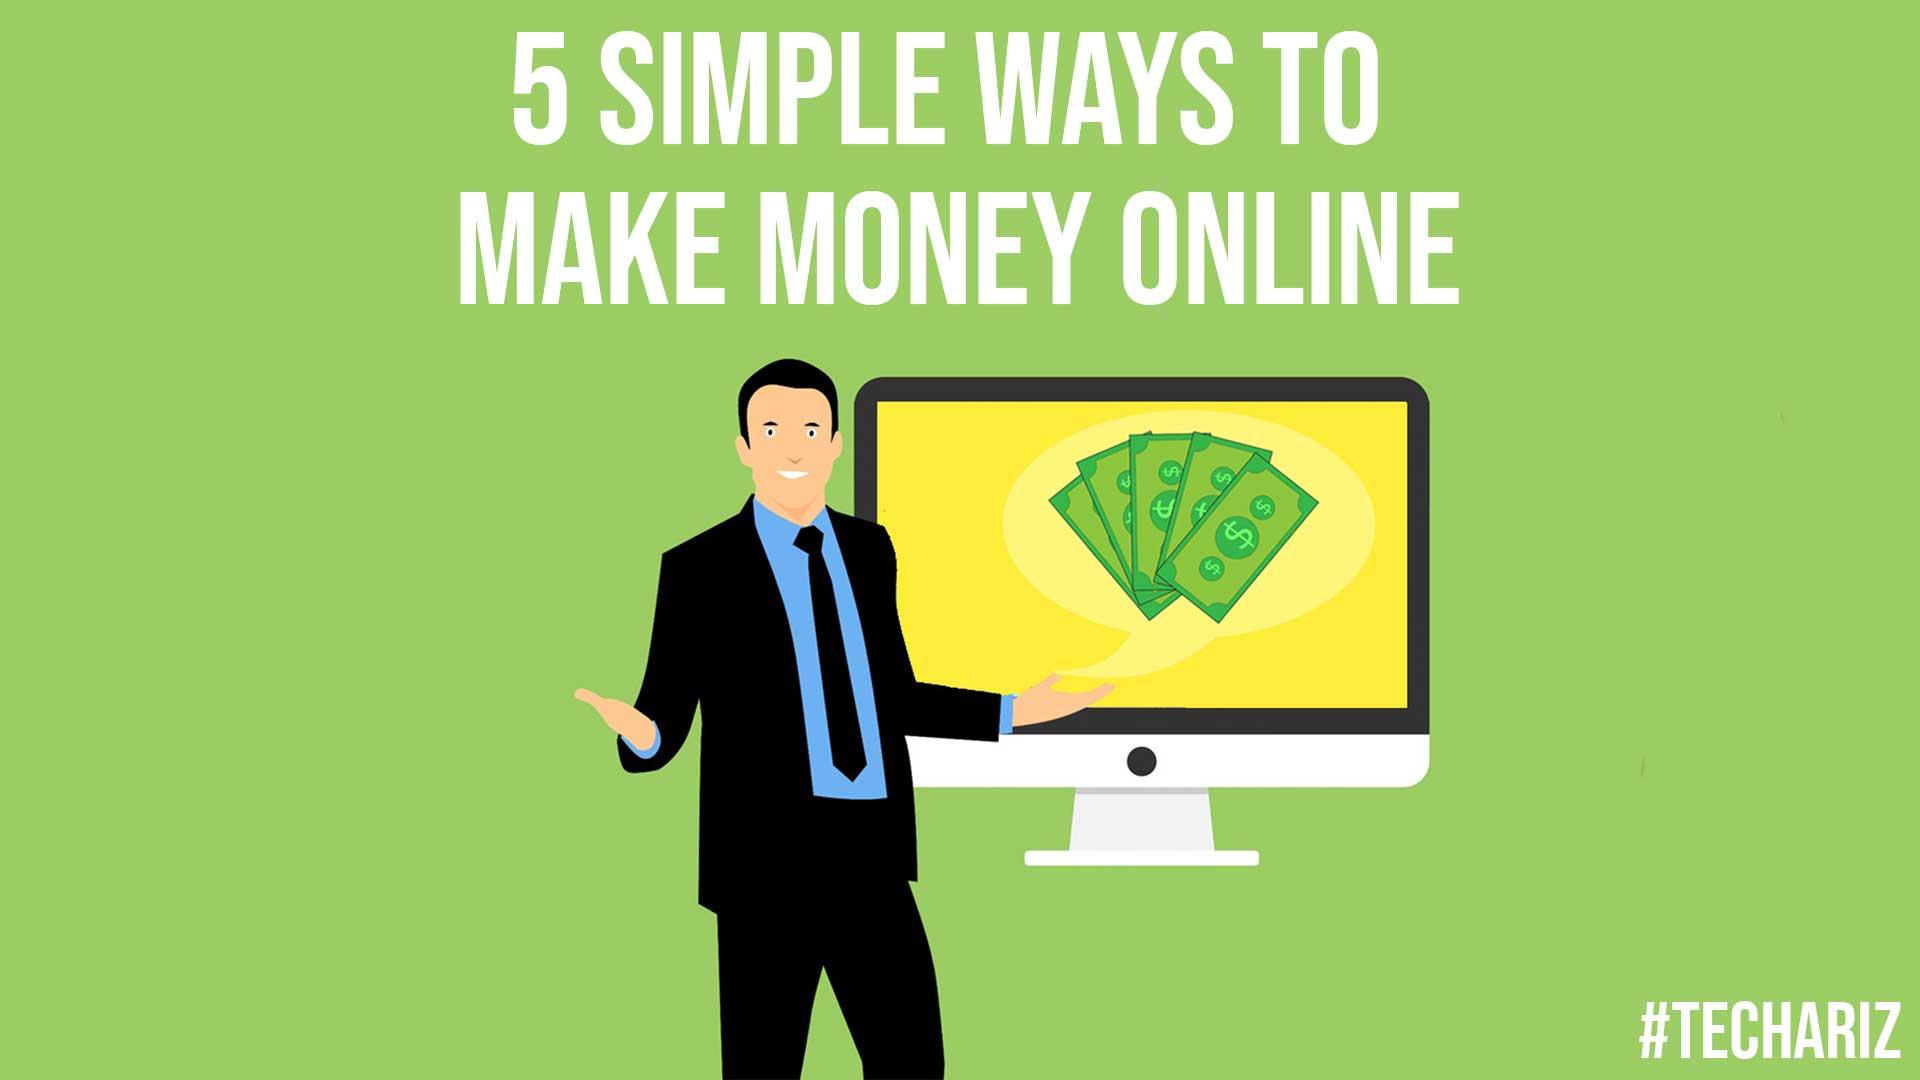 5 Simple Ways To Make Money Online